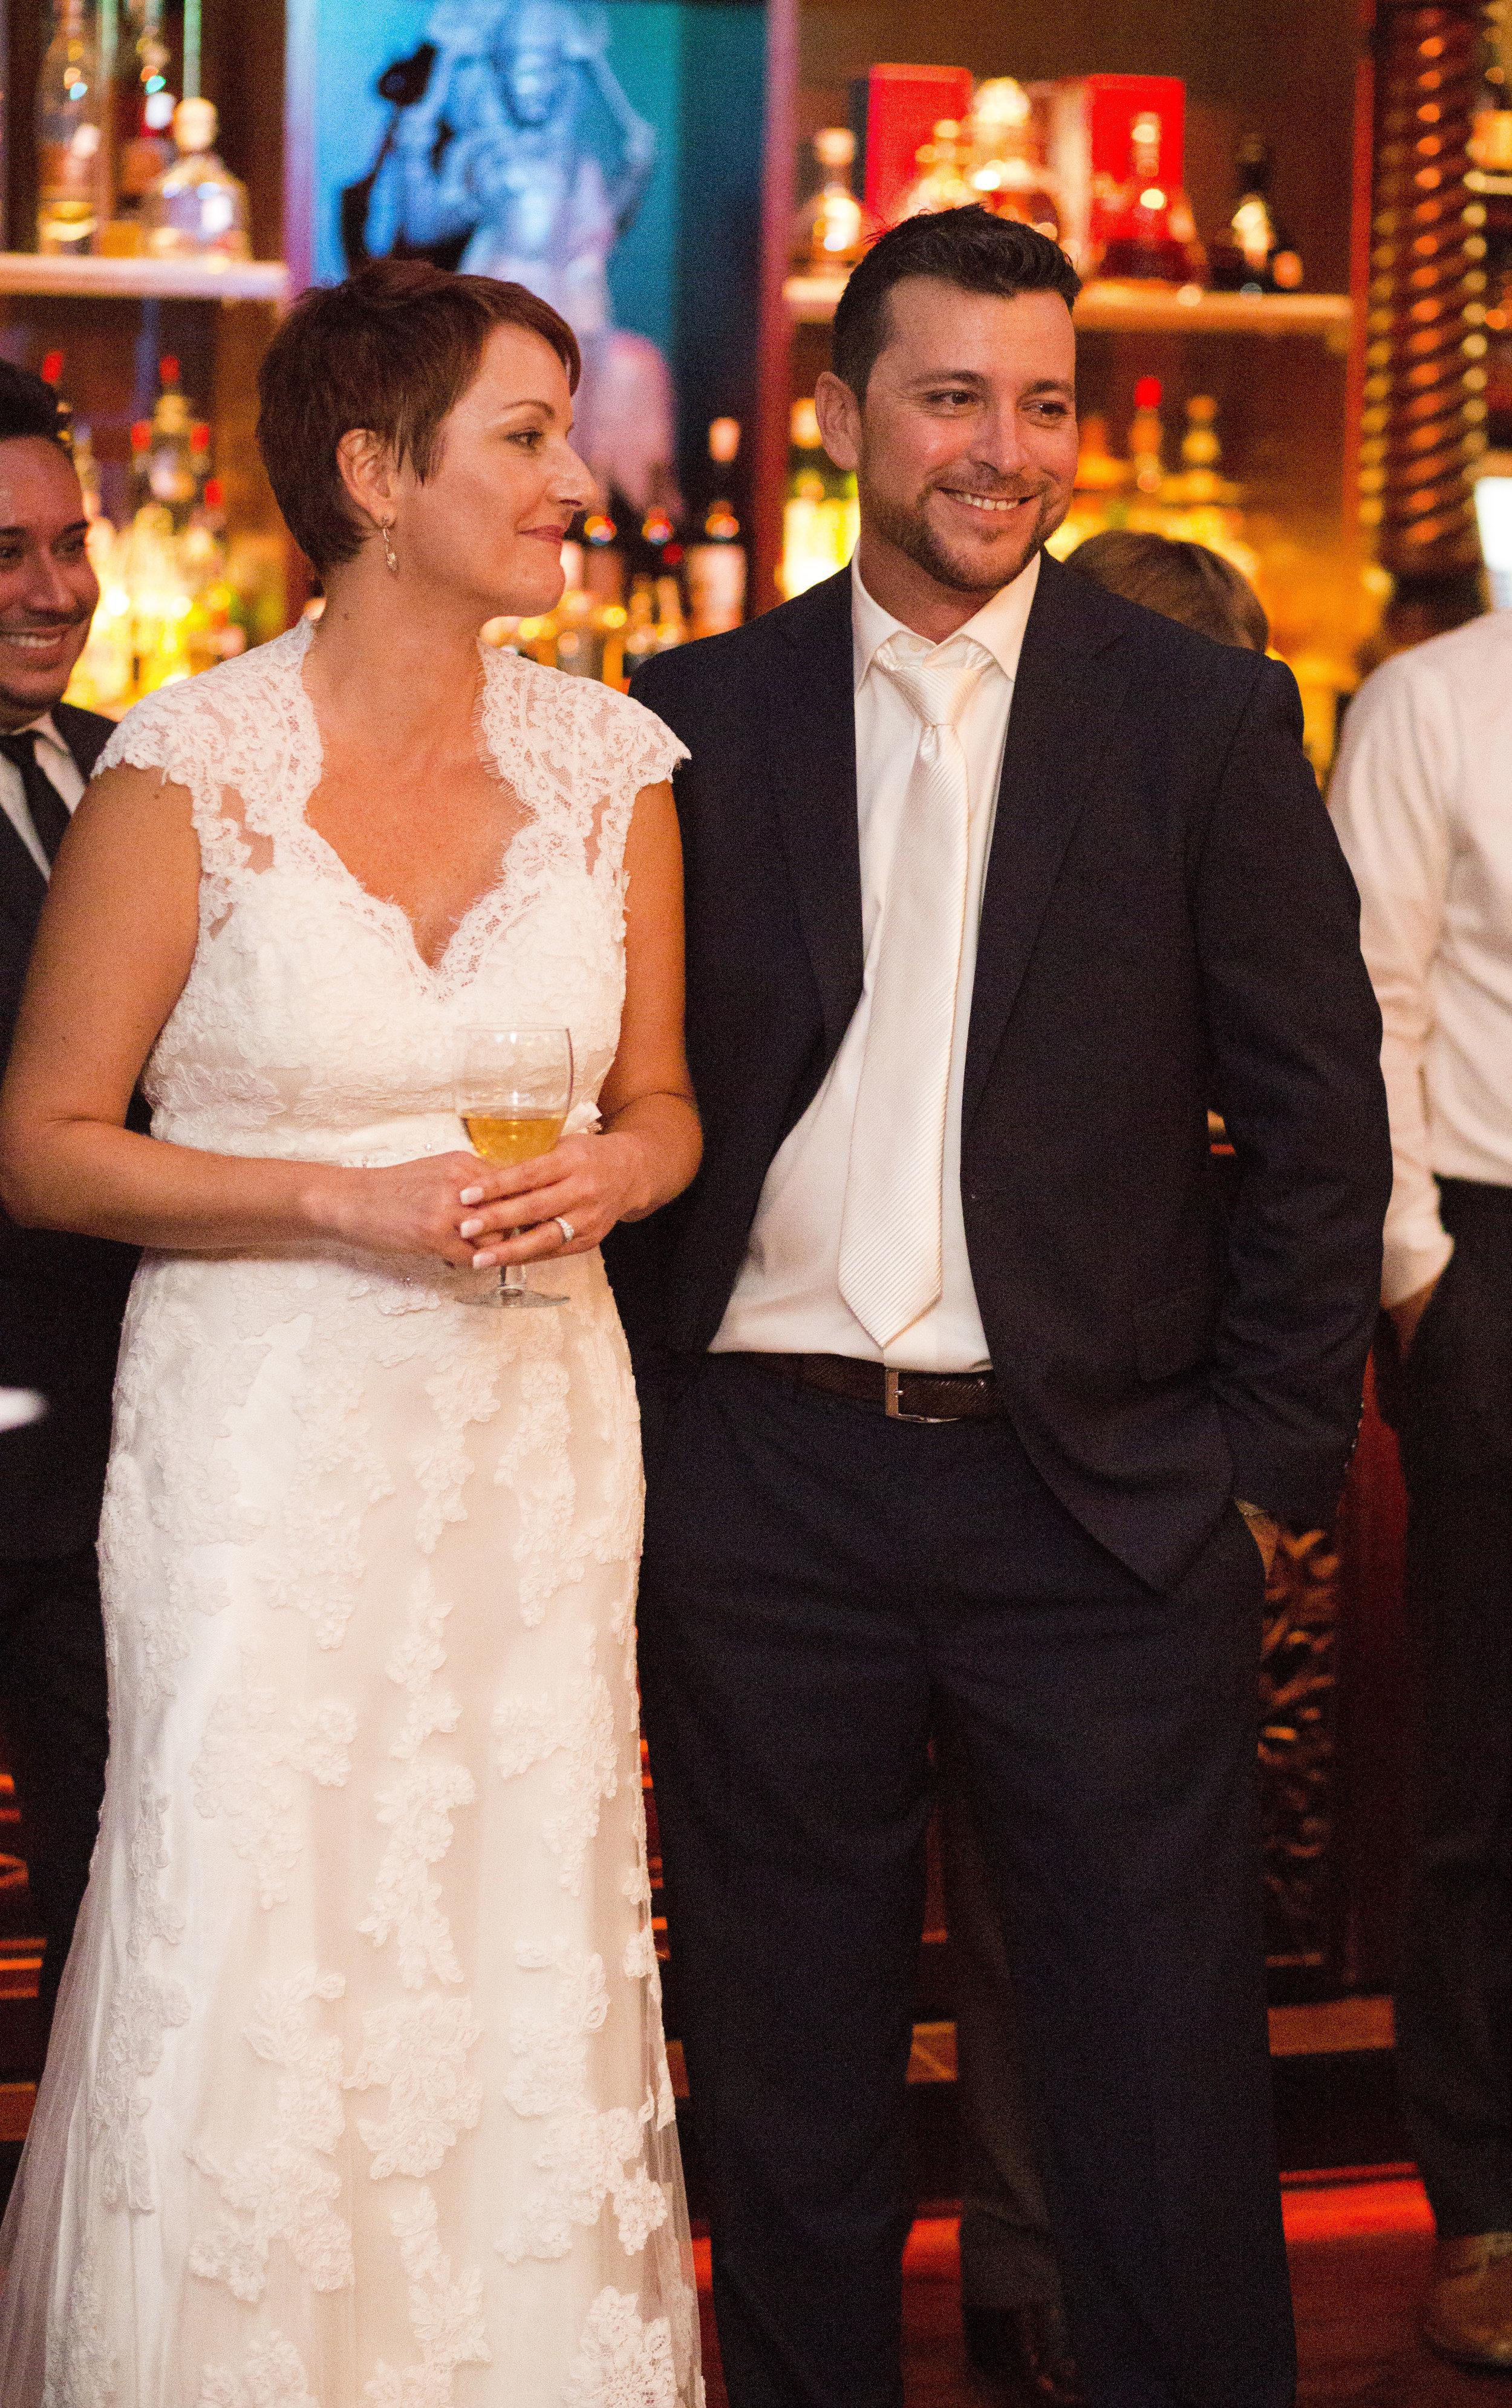 ATGI_Kat and Gabe Wedding 2016_2S8A5913.jpg